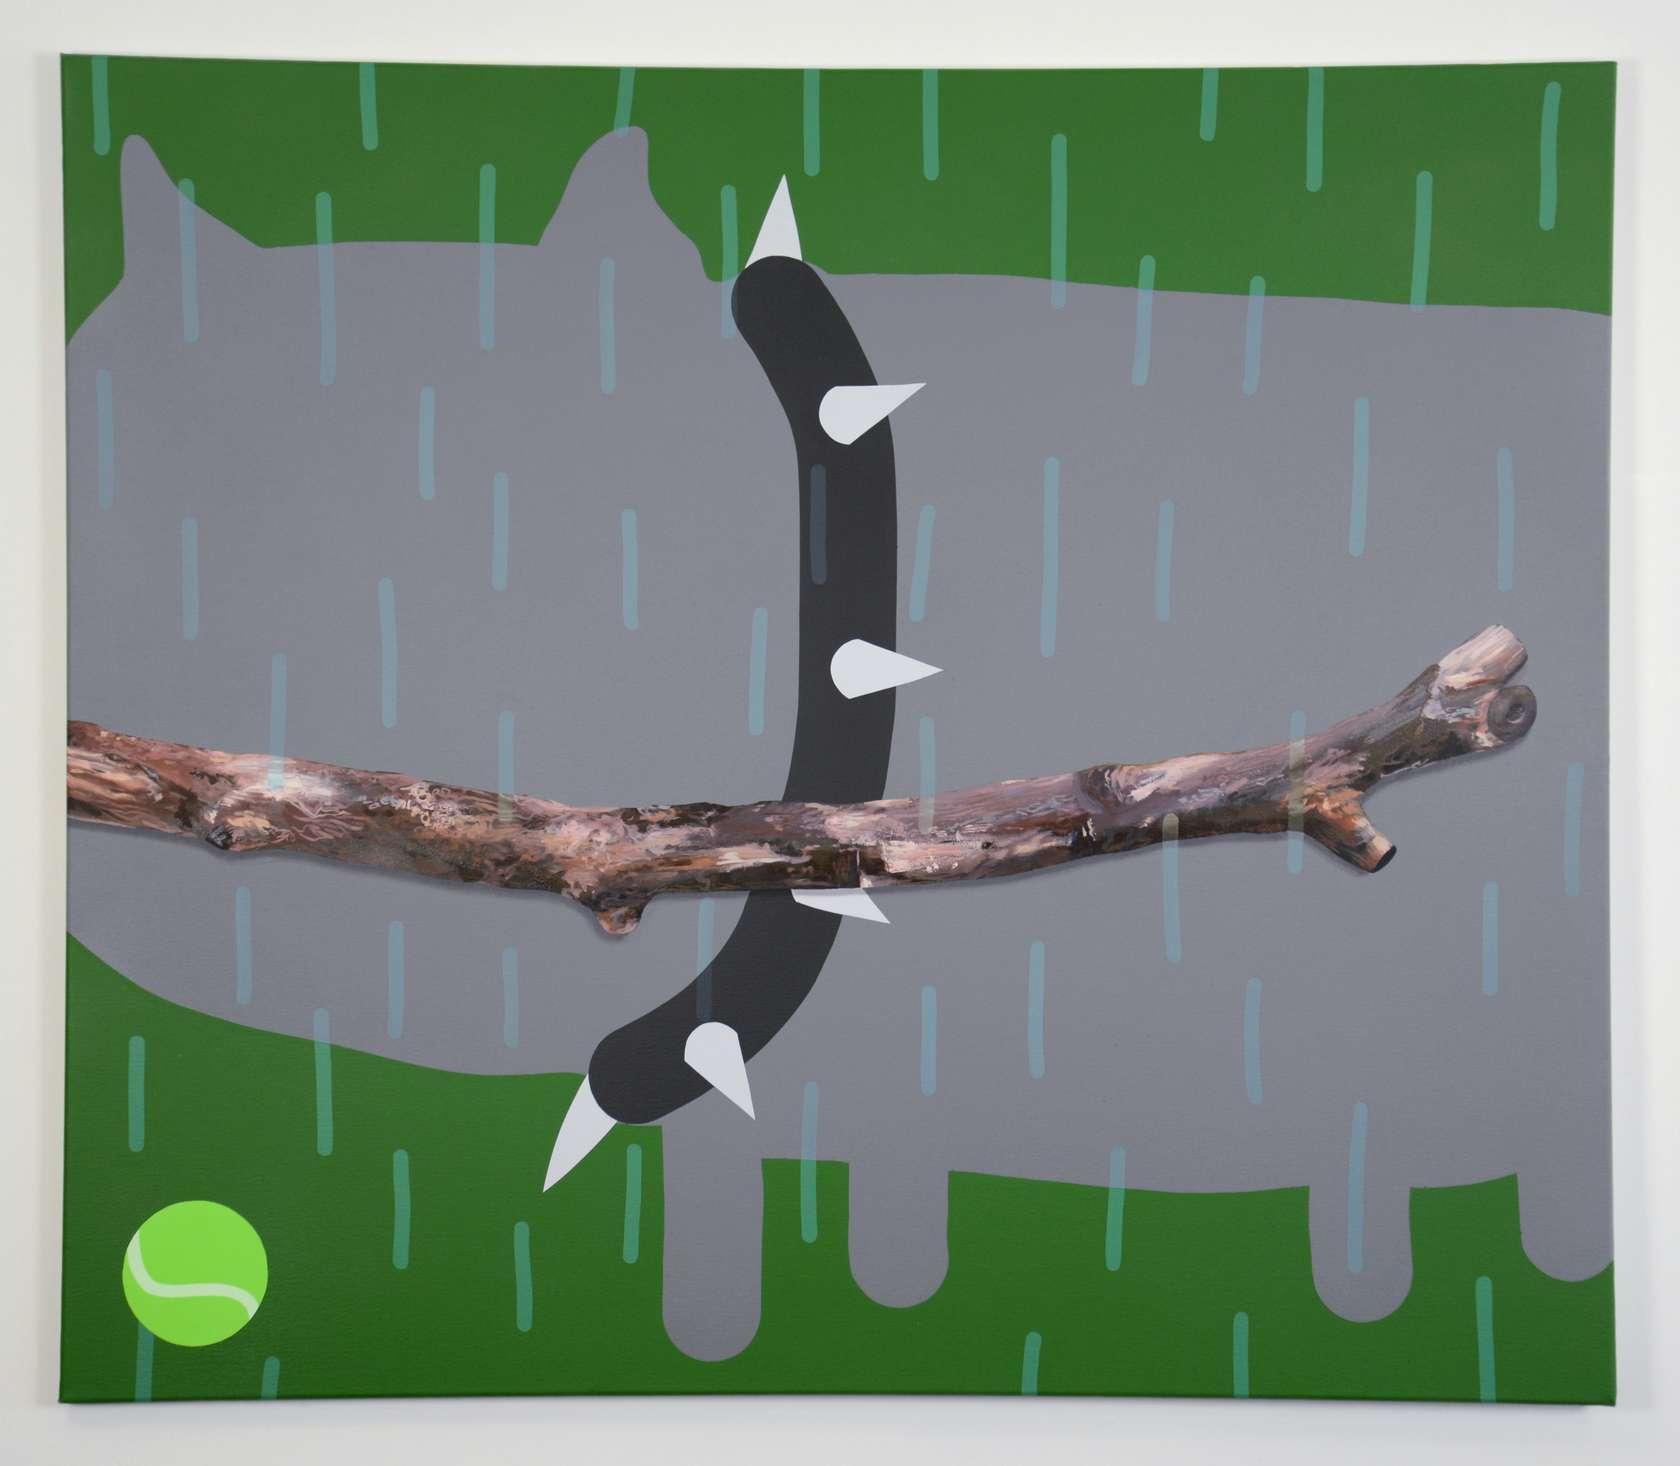 Oli Epp, Biggest Stick, 2017 Huile, acrylique et peinture aérosol sur toile102 × 120 cm / 40 1/8 × 47 2/8 in.